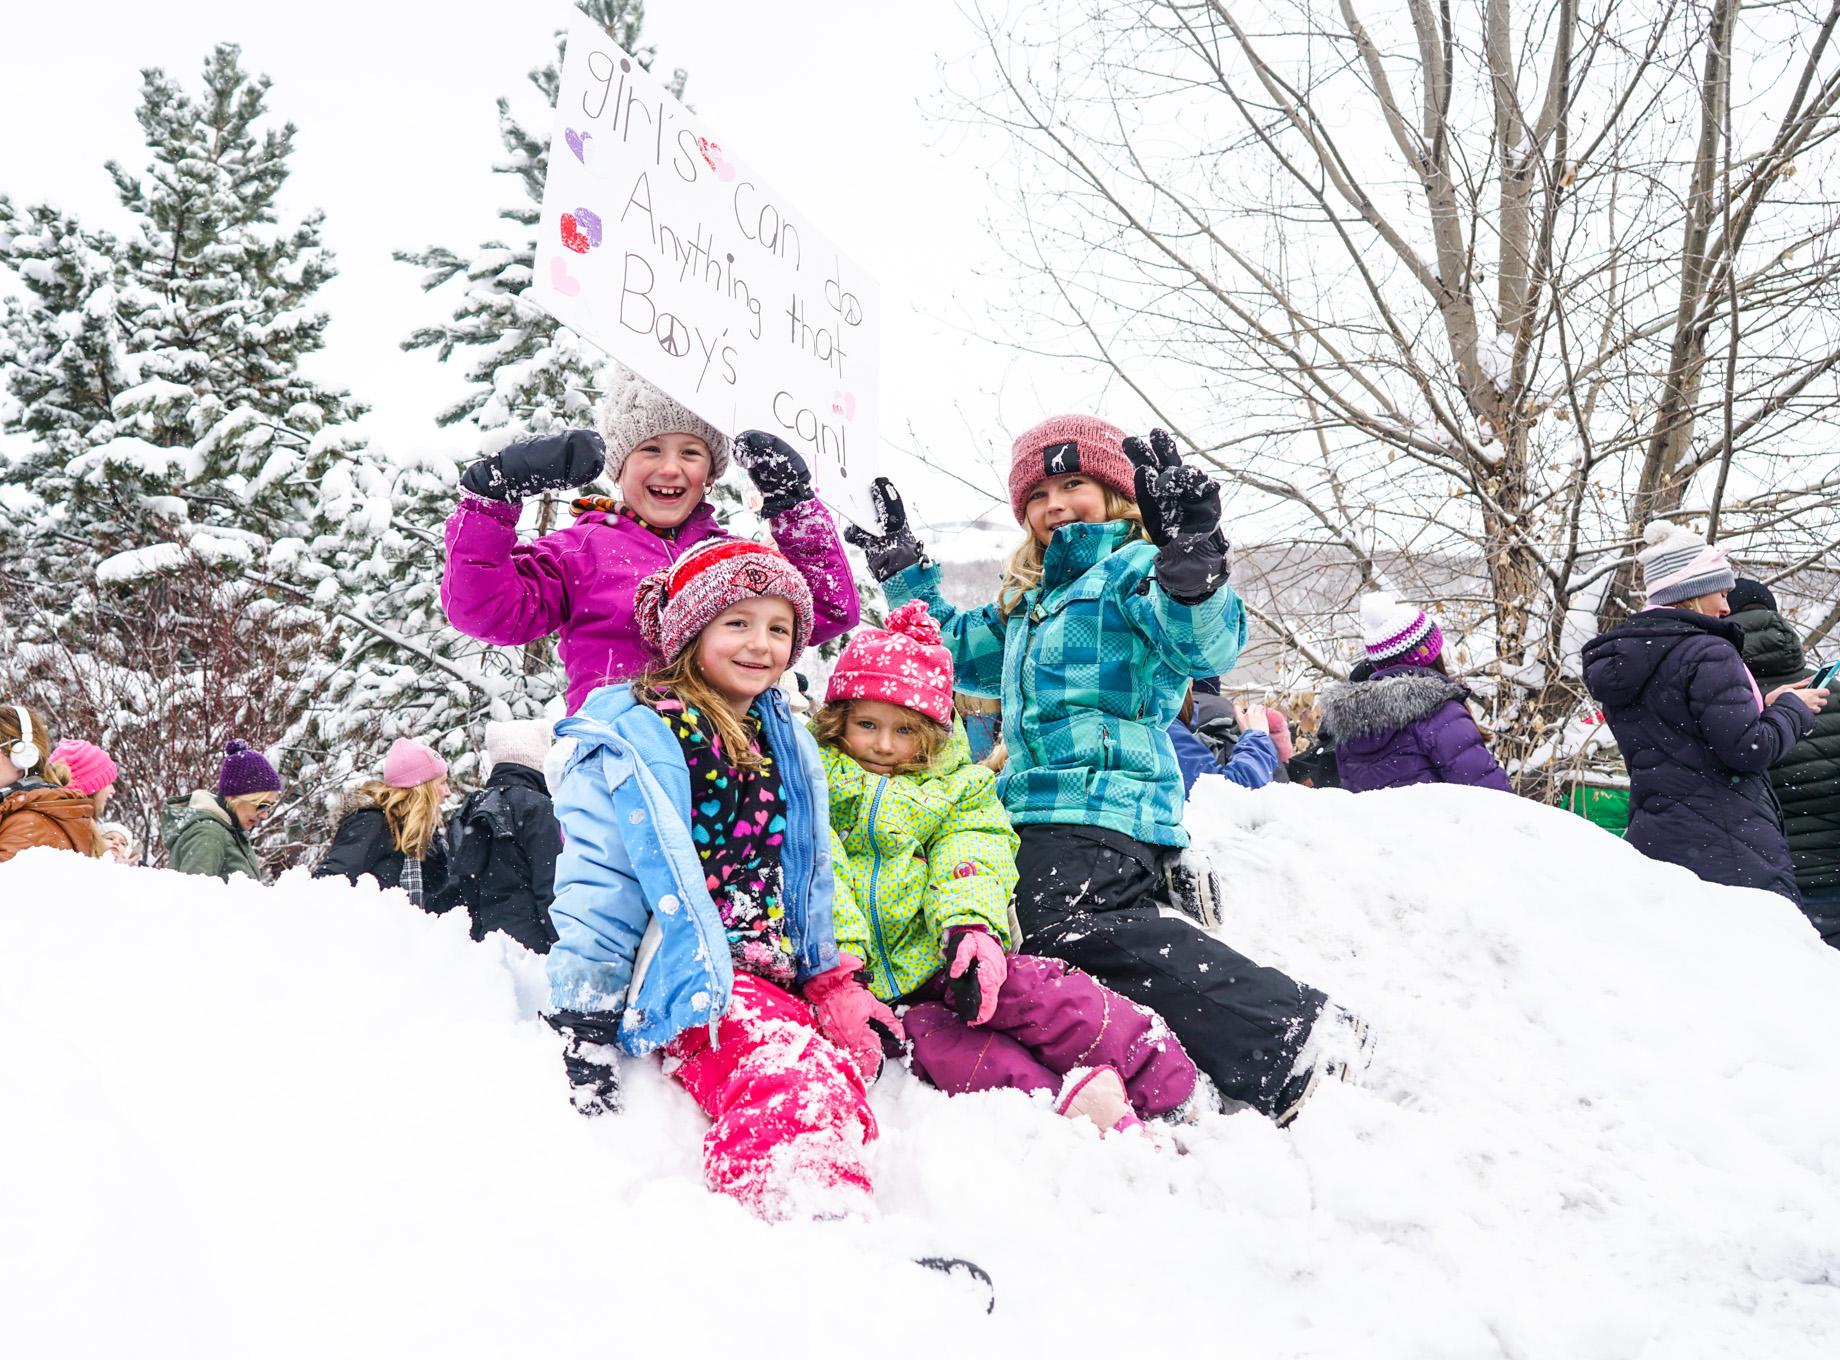 Women's March - January 21, 2017 - Park City, Utah